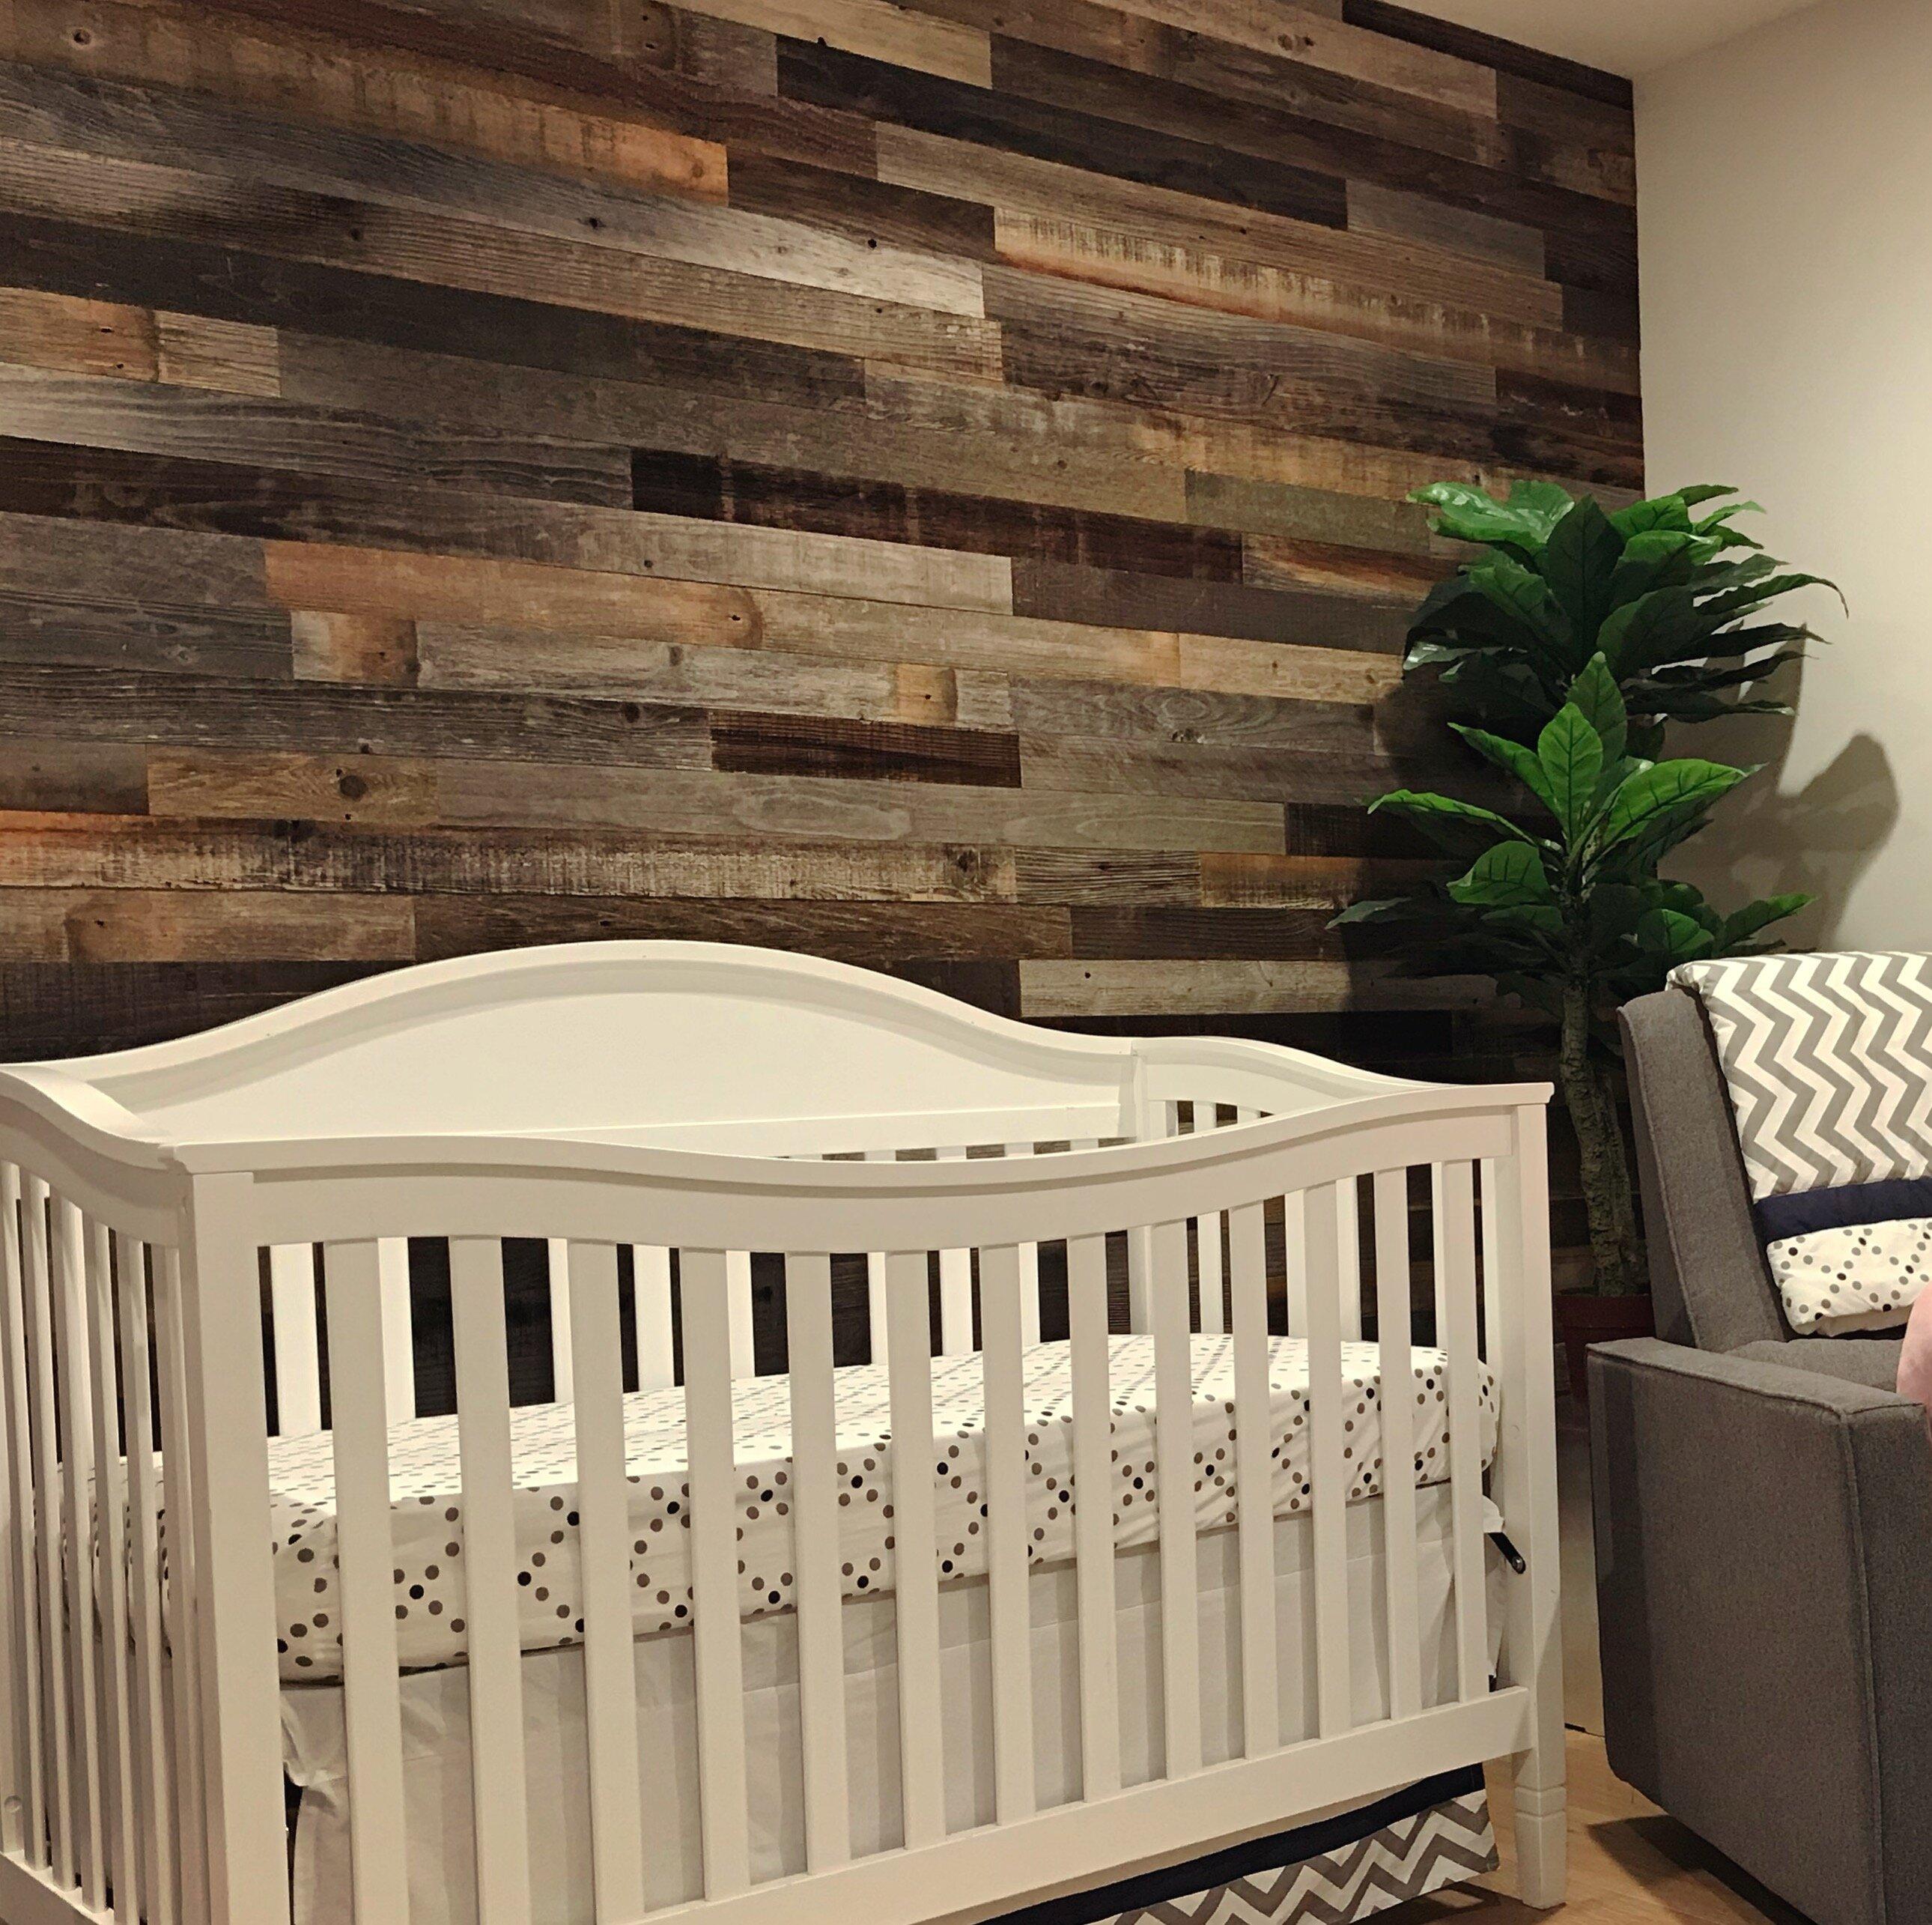 Wondrous Faux Wood Wall Peel And Stick Wayfair Interior Design Ideas Helimdqseriescom